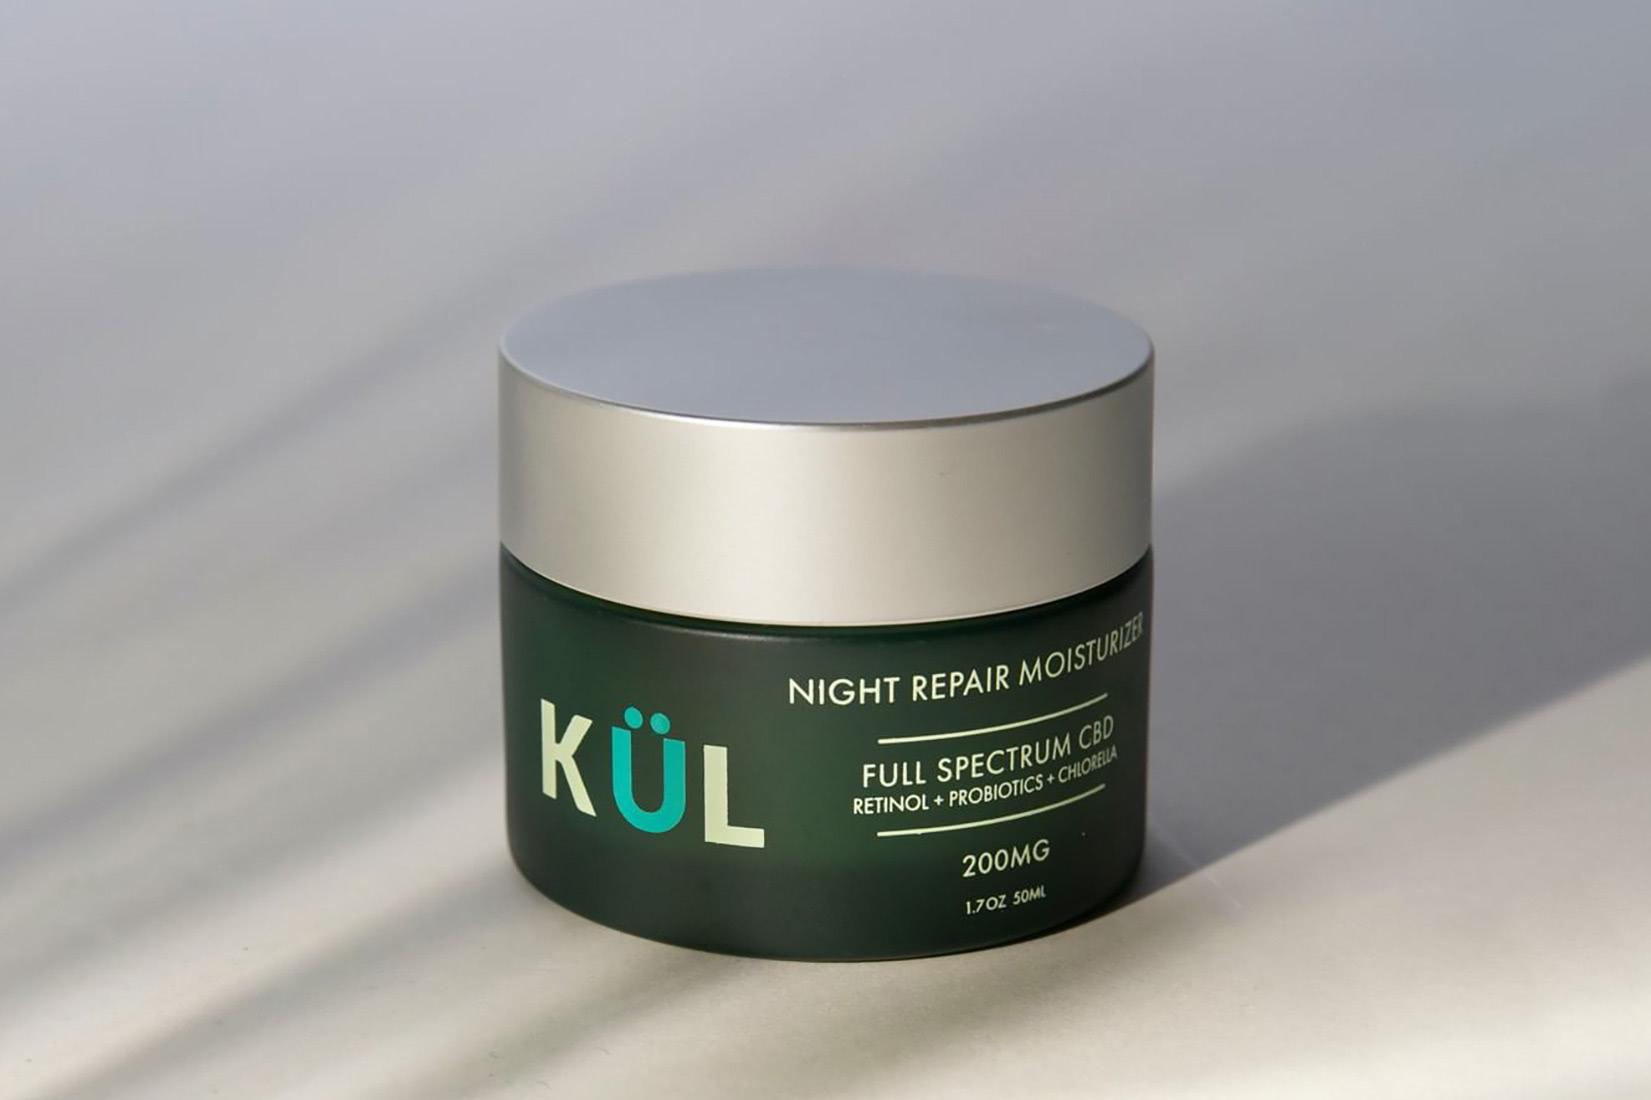 best natural organic beauty skincare kulcbd night repair moisturizer - Luxe Digital